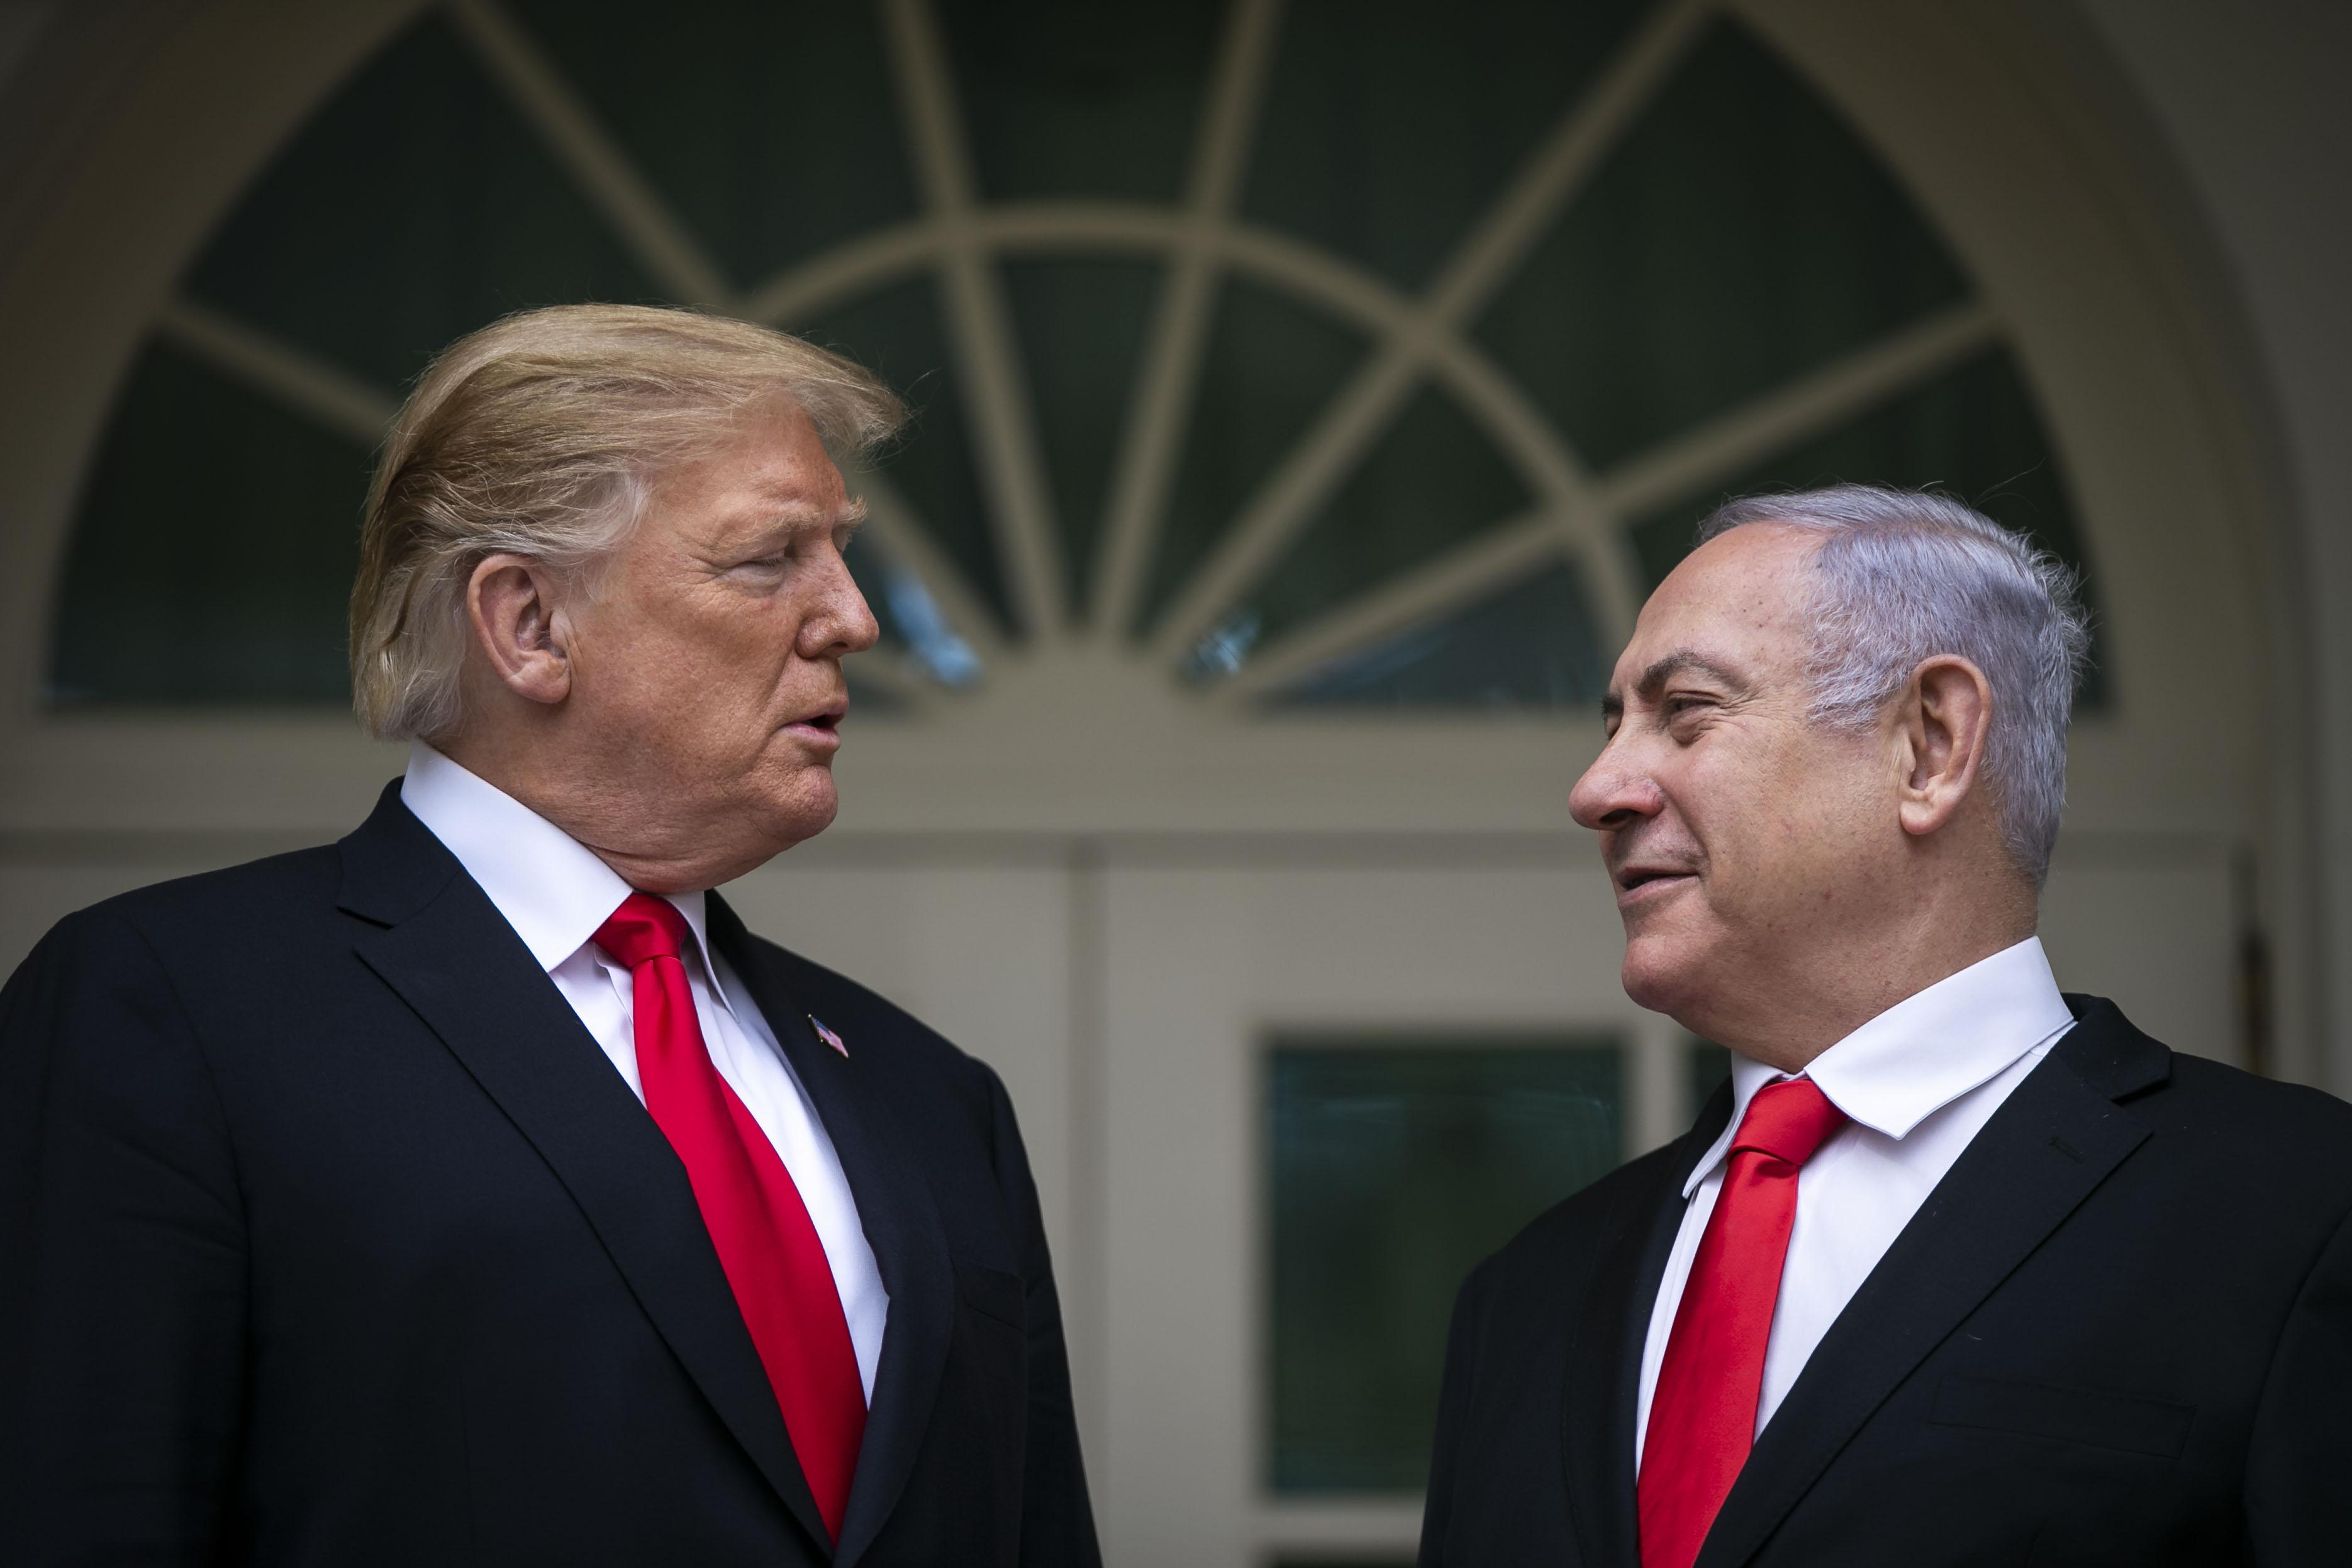 bloomberg.com - Alisa Odenheimer - Netanyahu Says Israel Will Name Community in Golan for Trump